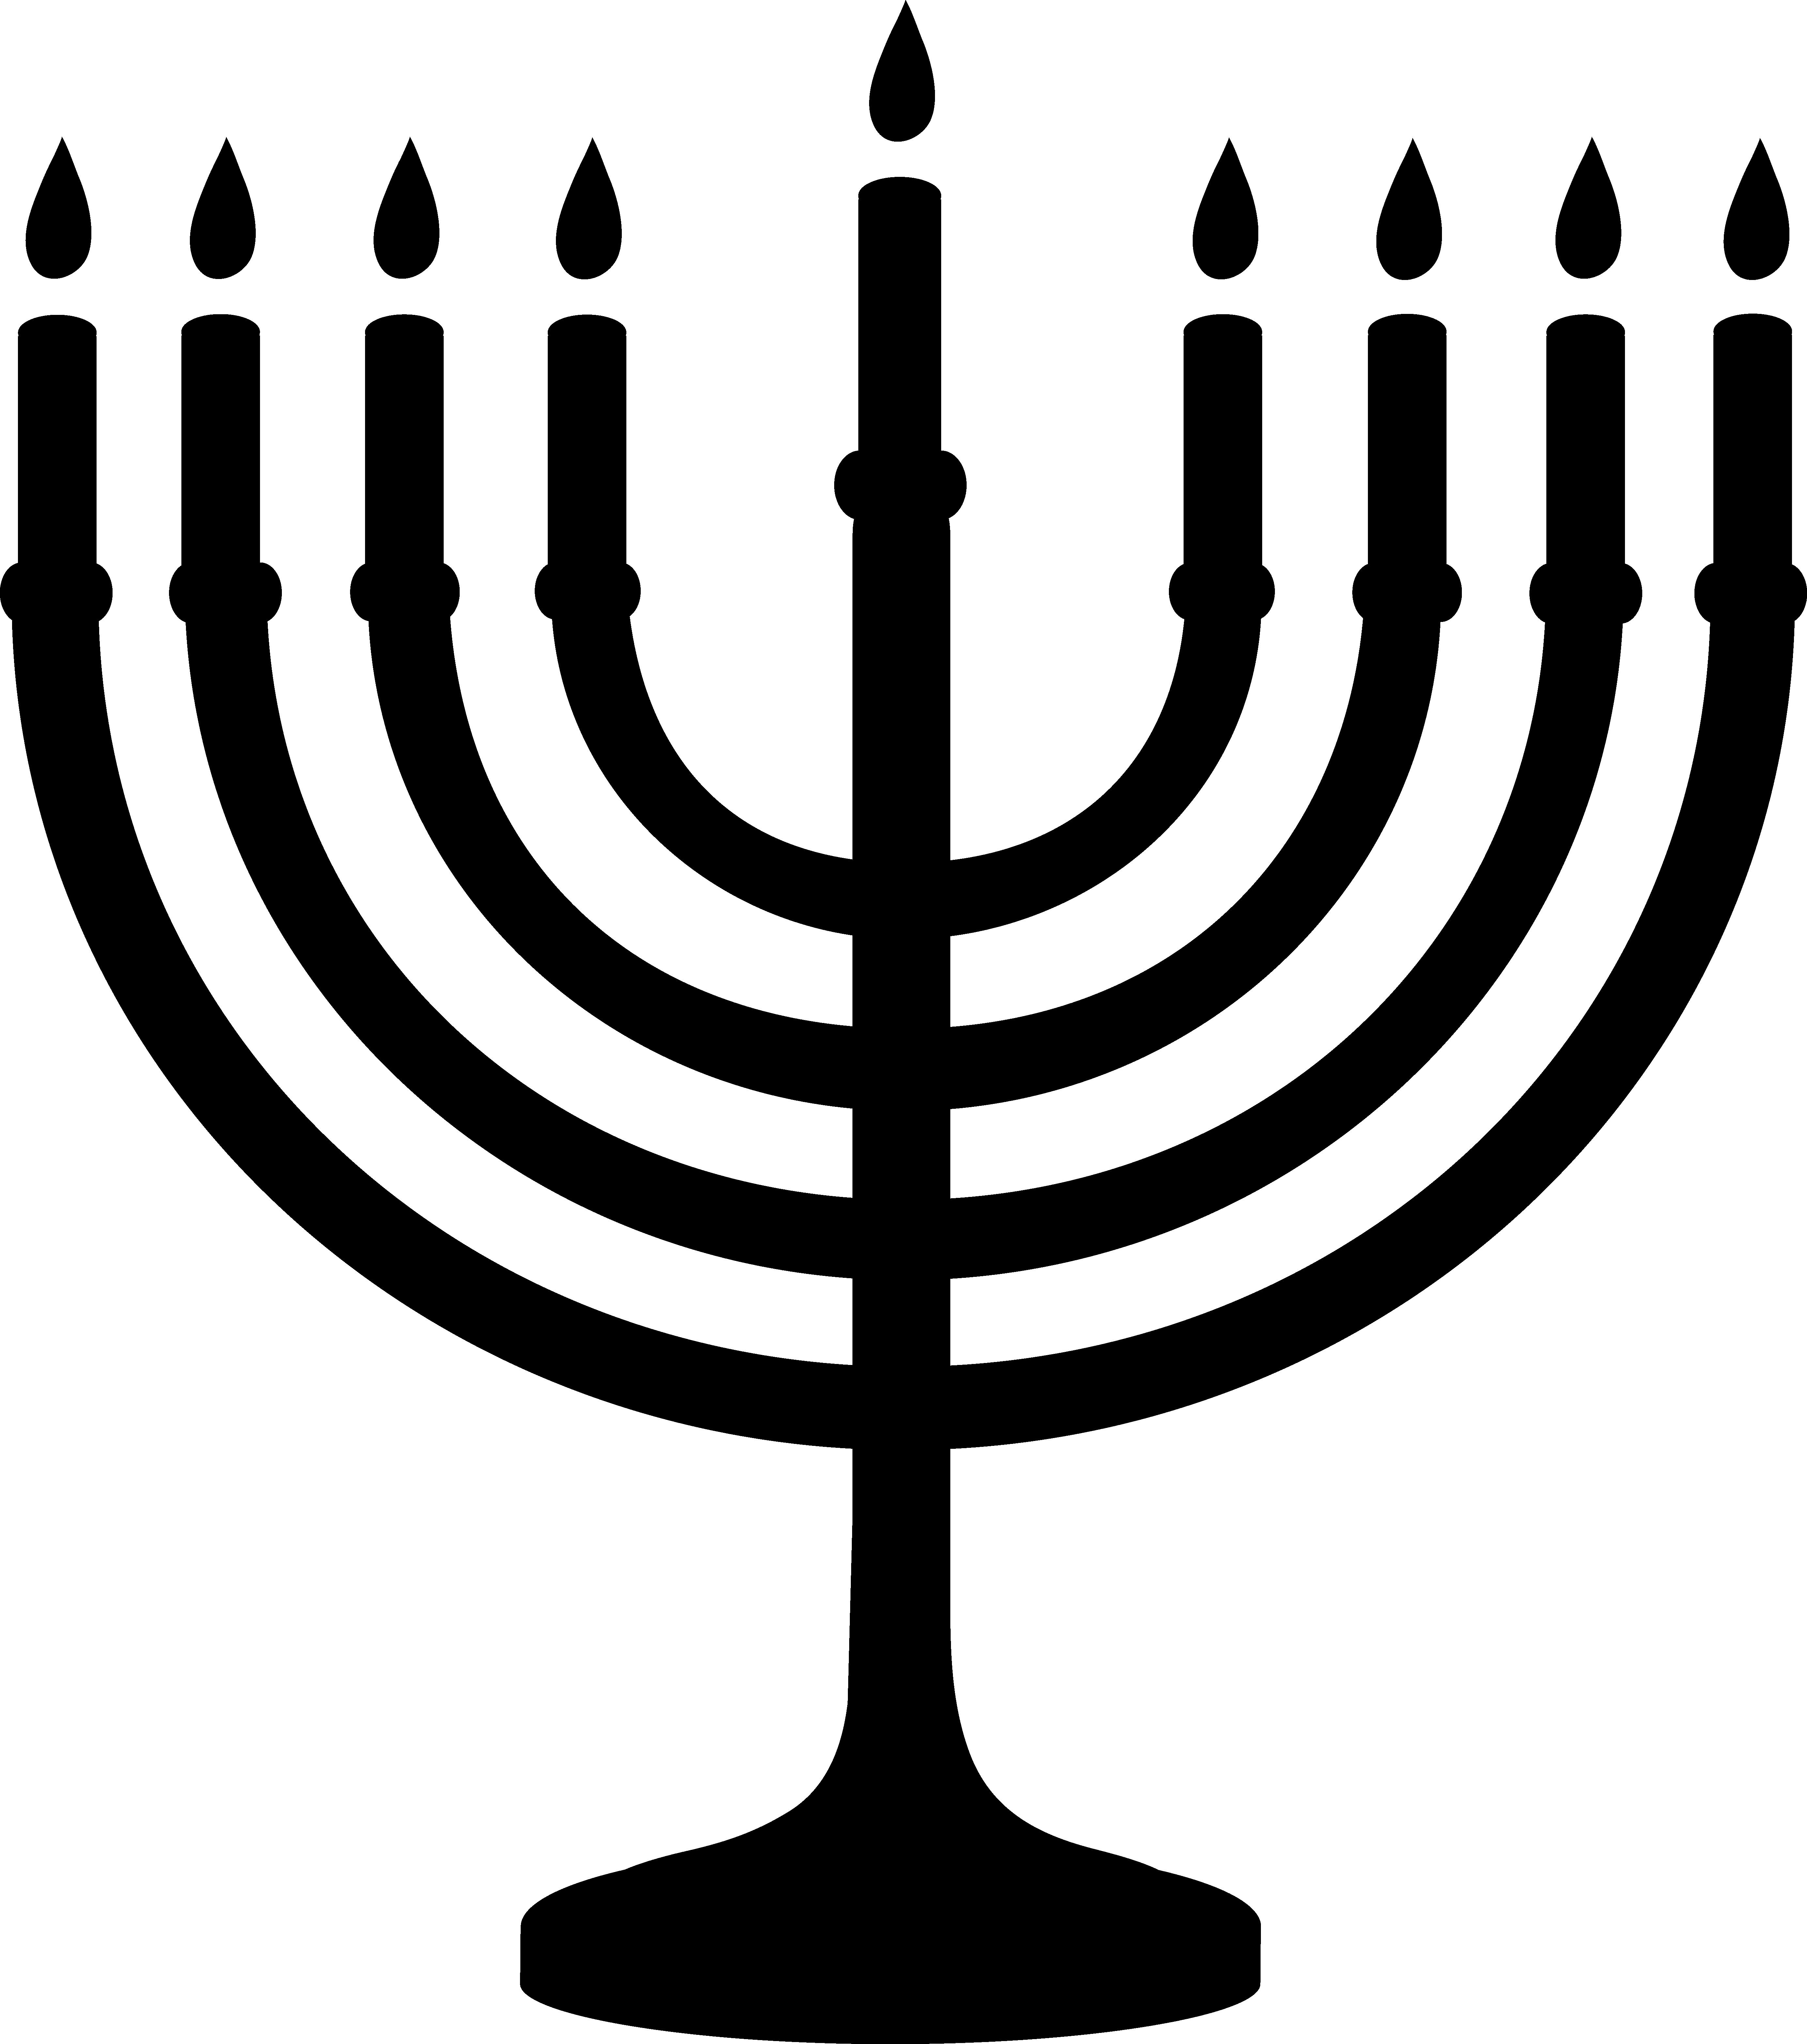 Clipart door passover. Hanukkah menorah silhouette free